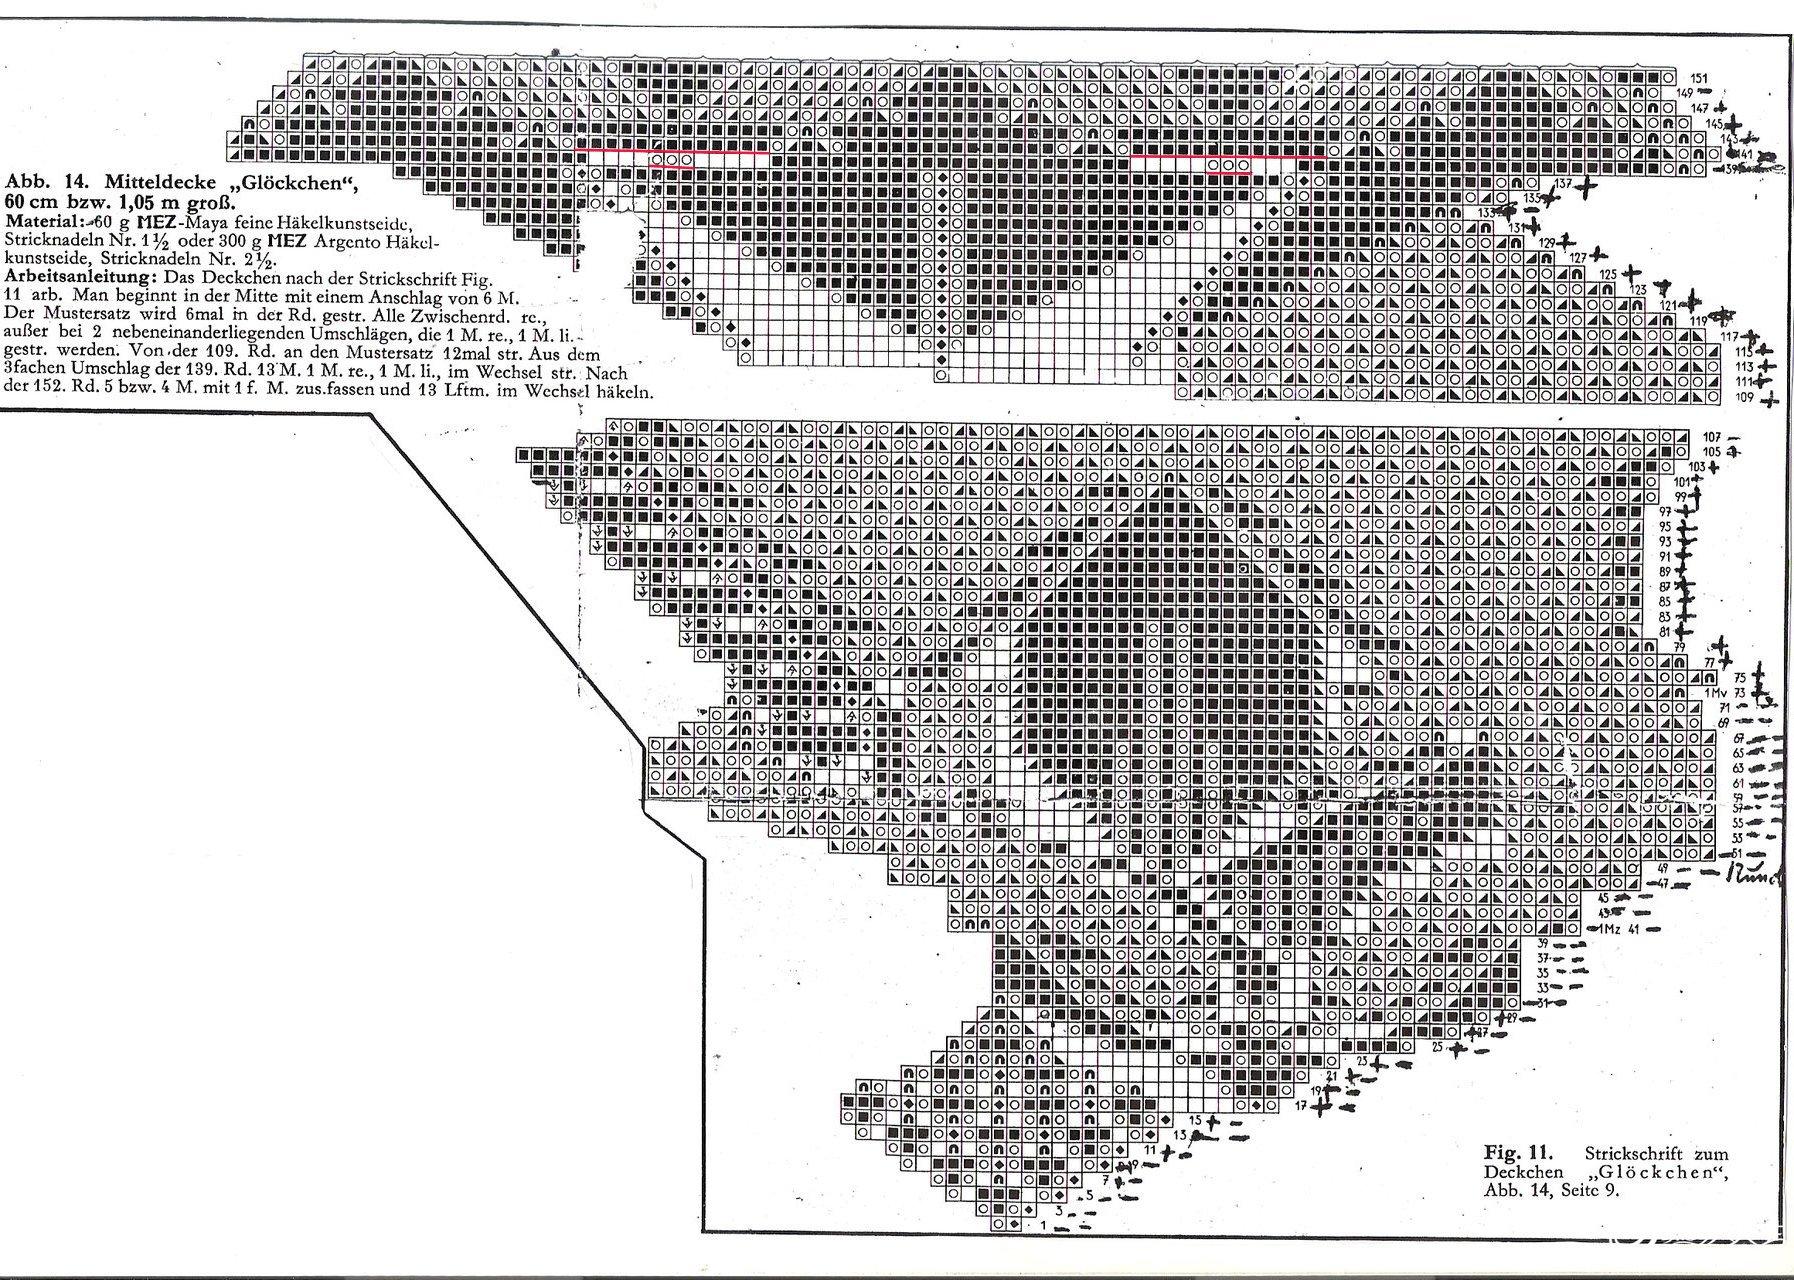 Beyer 7003 -14款图解副本.jpg